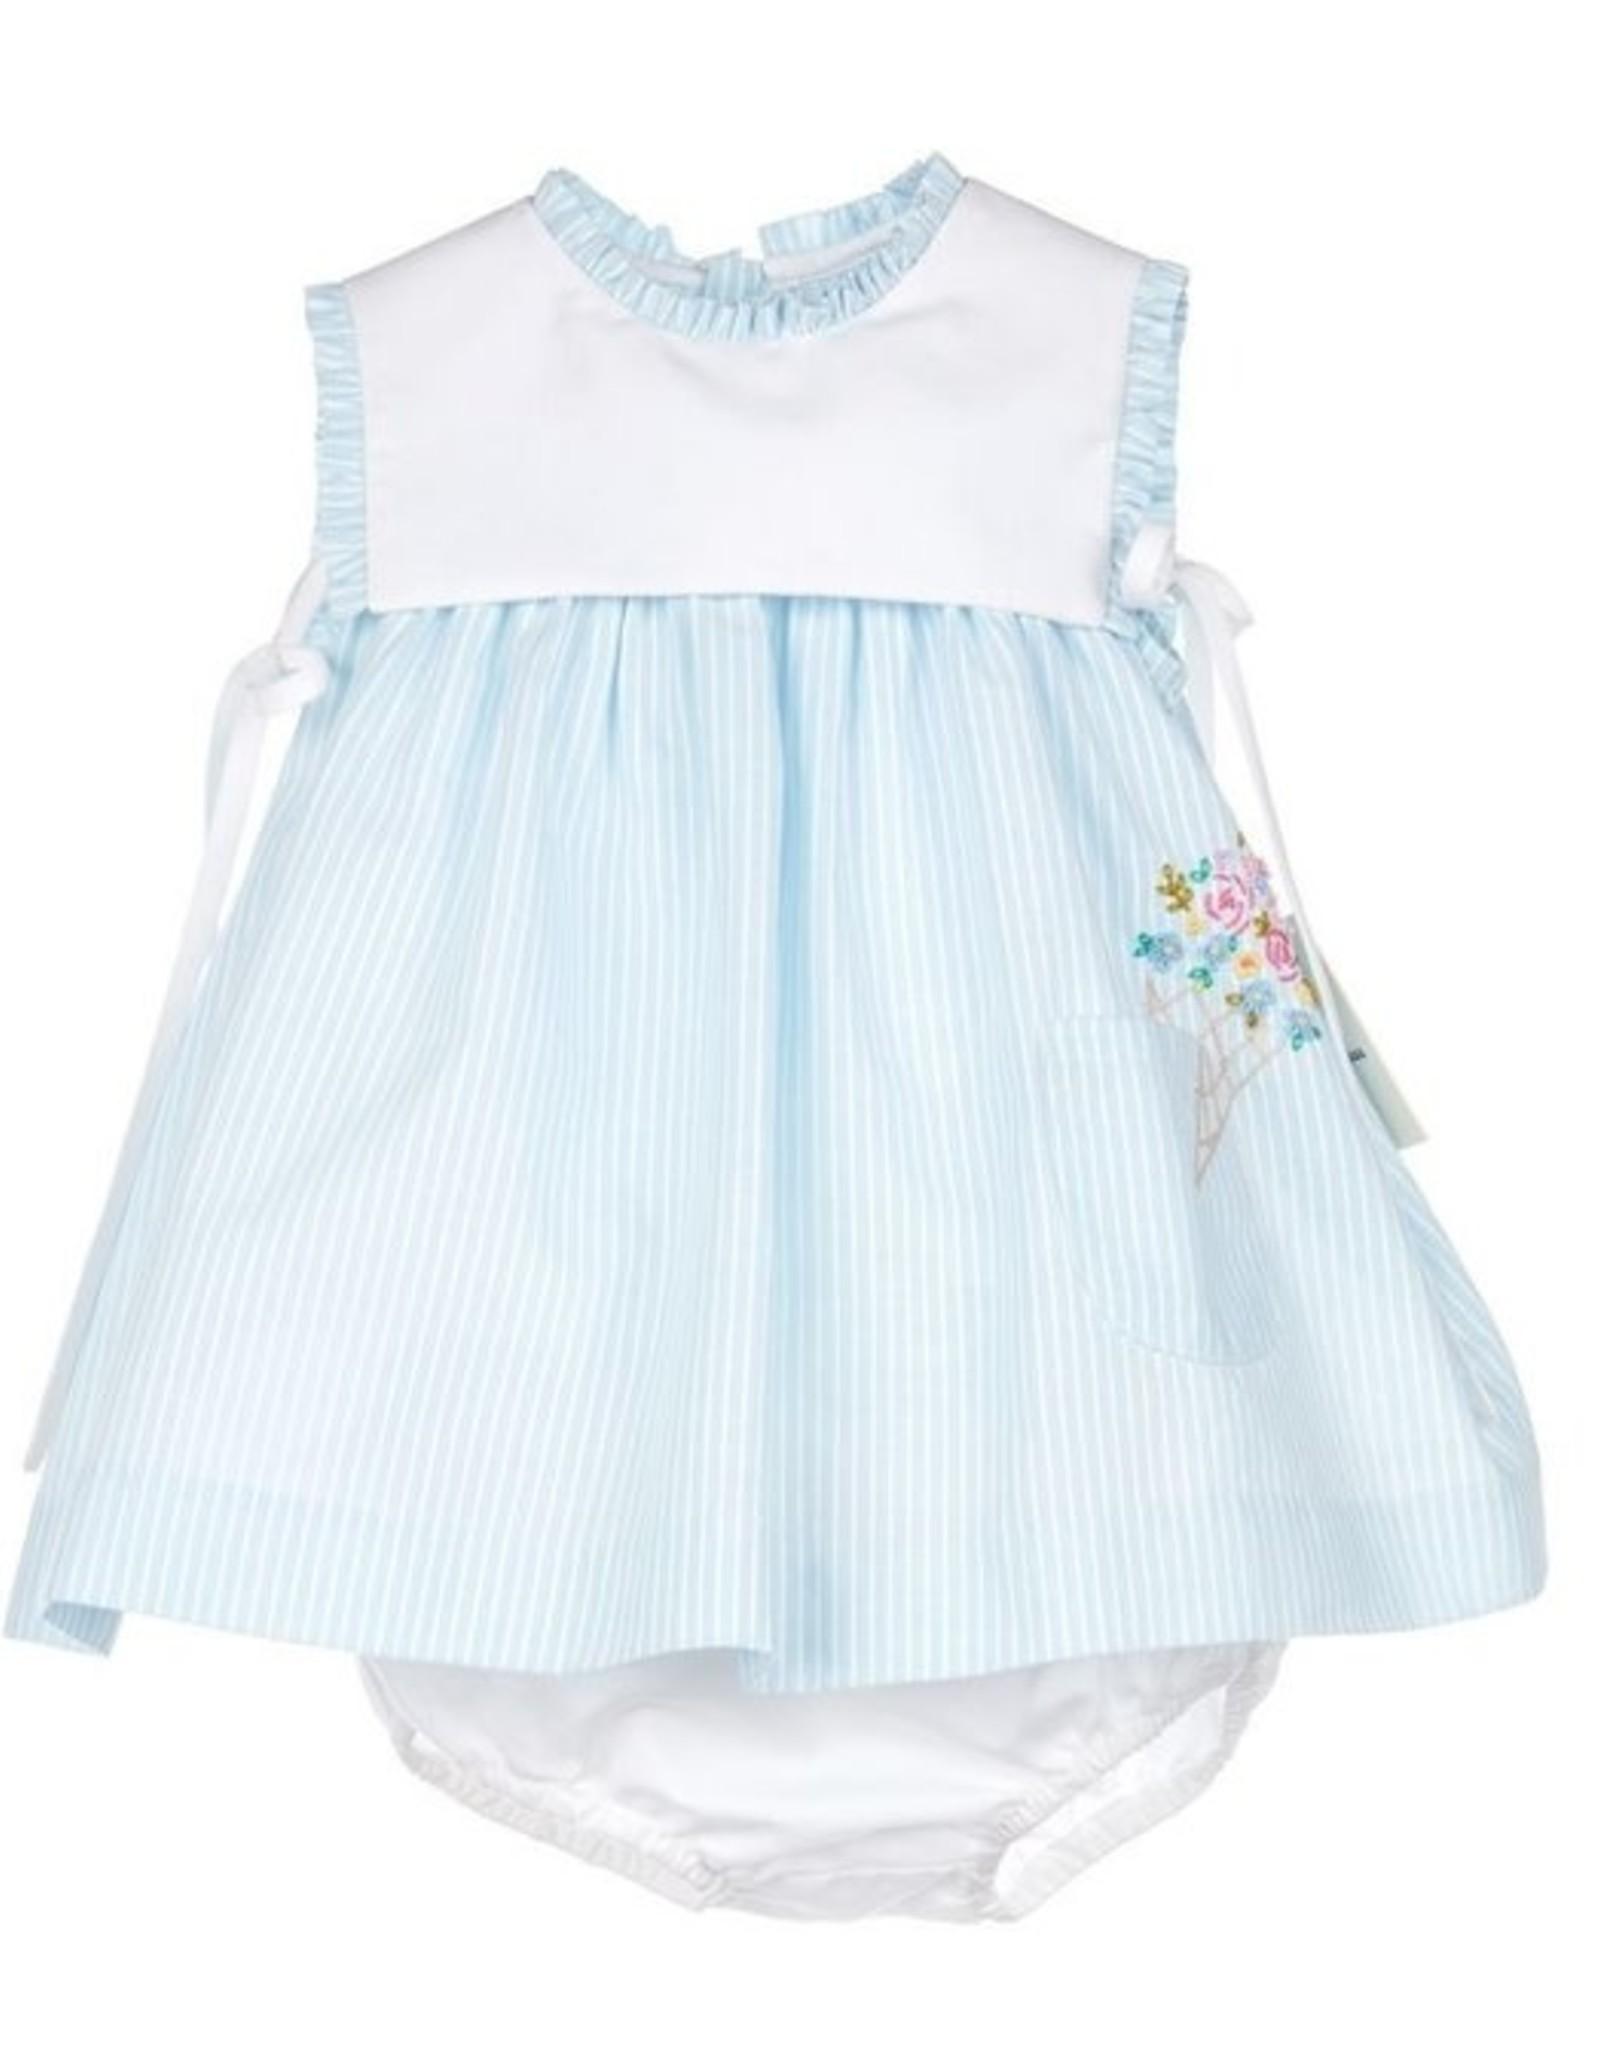 Sophie & Lucas Easton Stripes Dress Blue